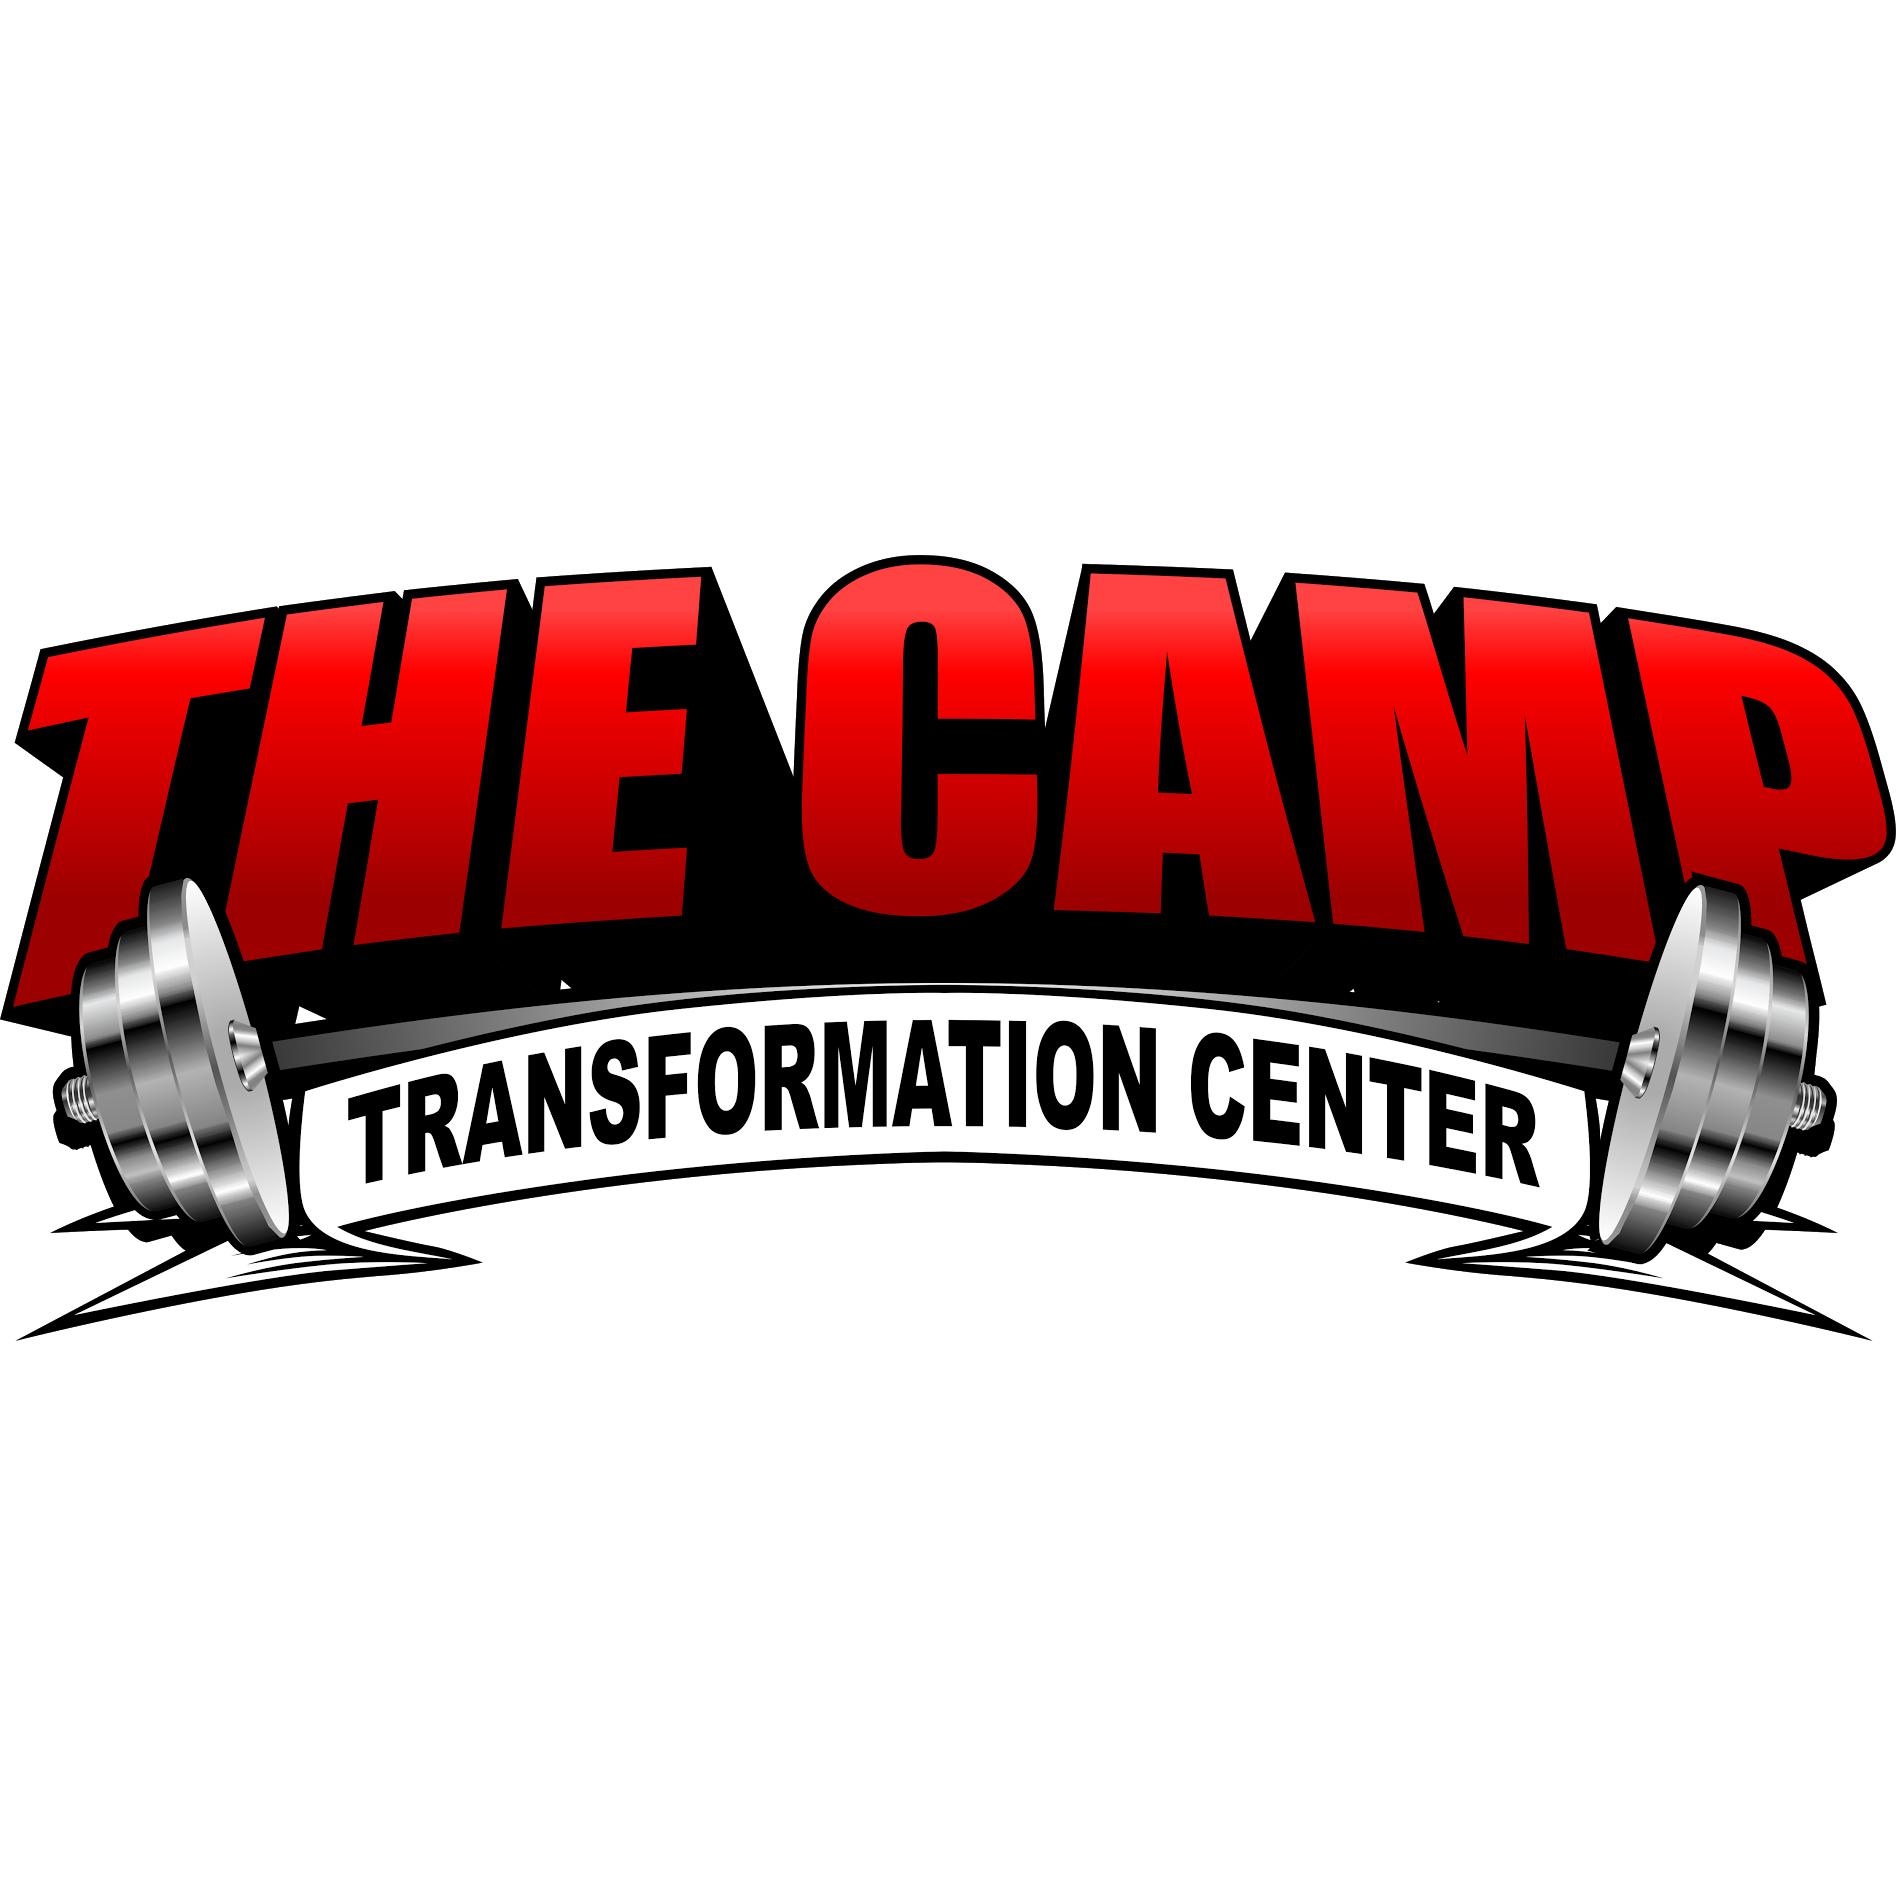 The Camp Transformation Center - Rancho Cucamonga - Rancho Cucamonga, CA 91730 - (909)631-3107 | ShowMeLocal.com